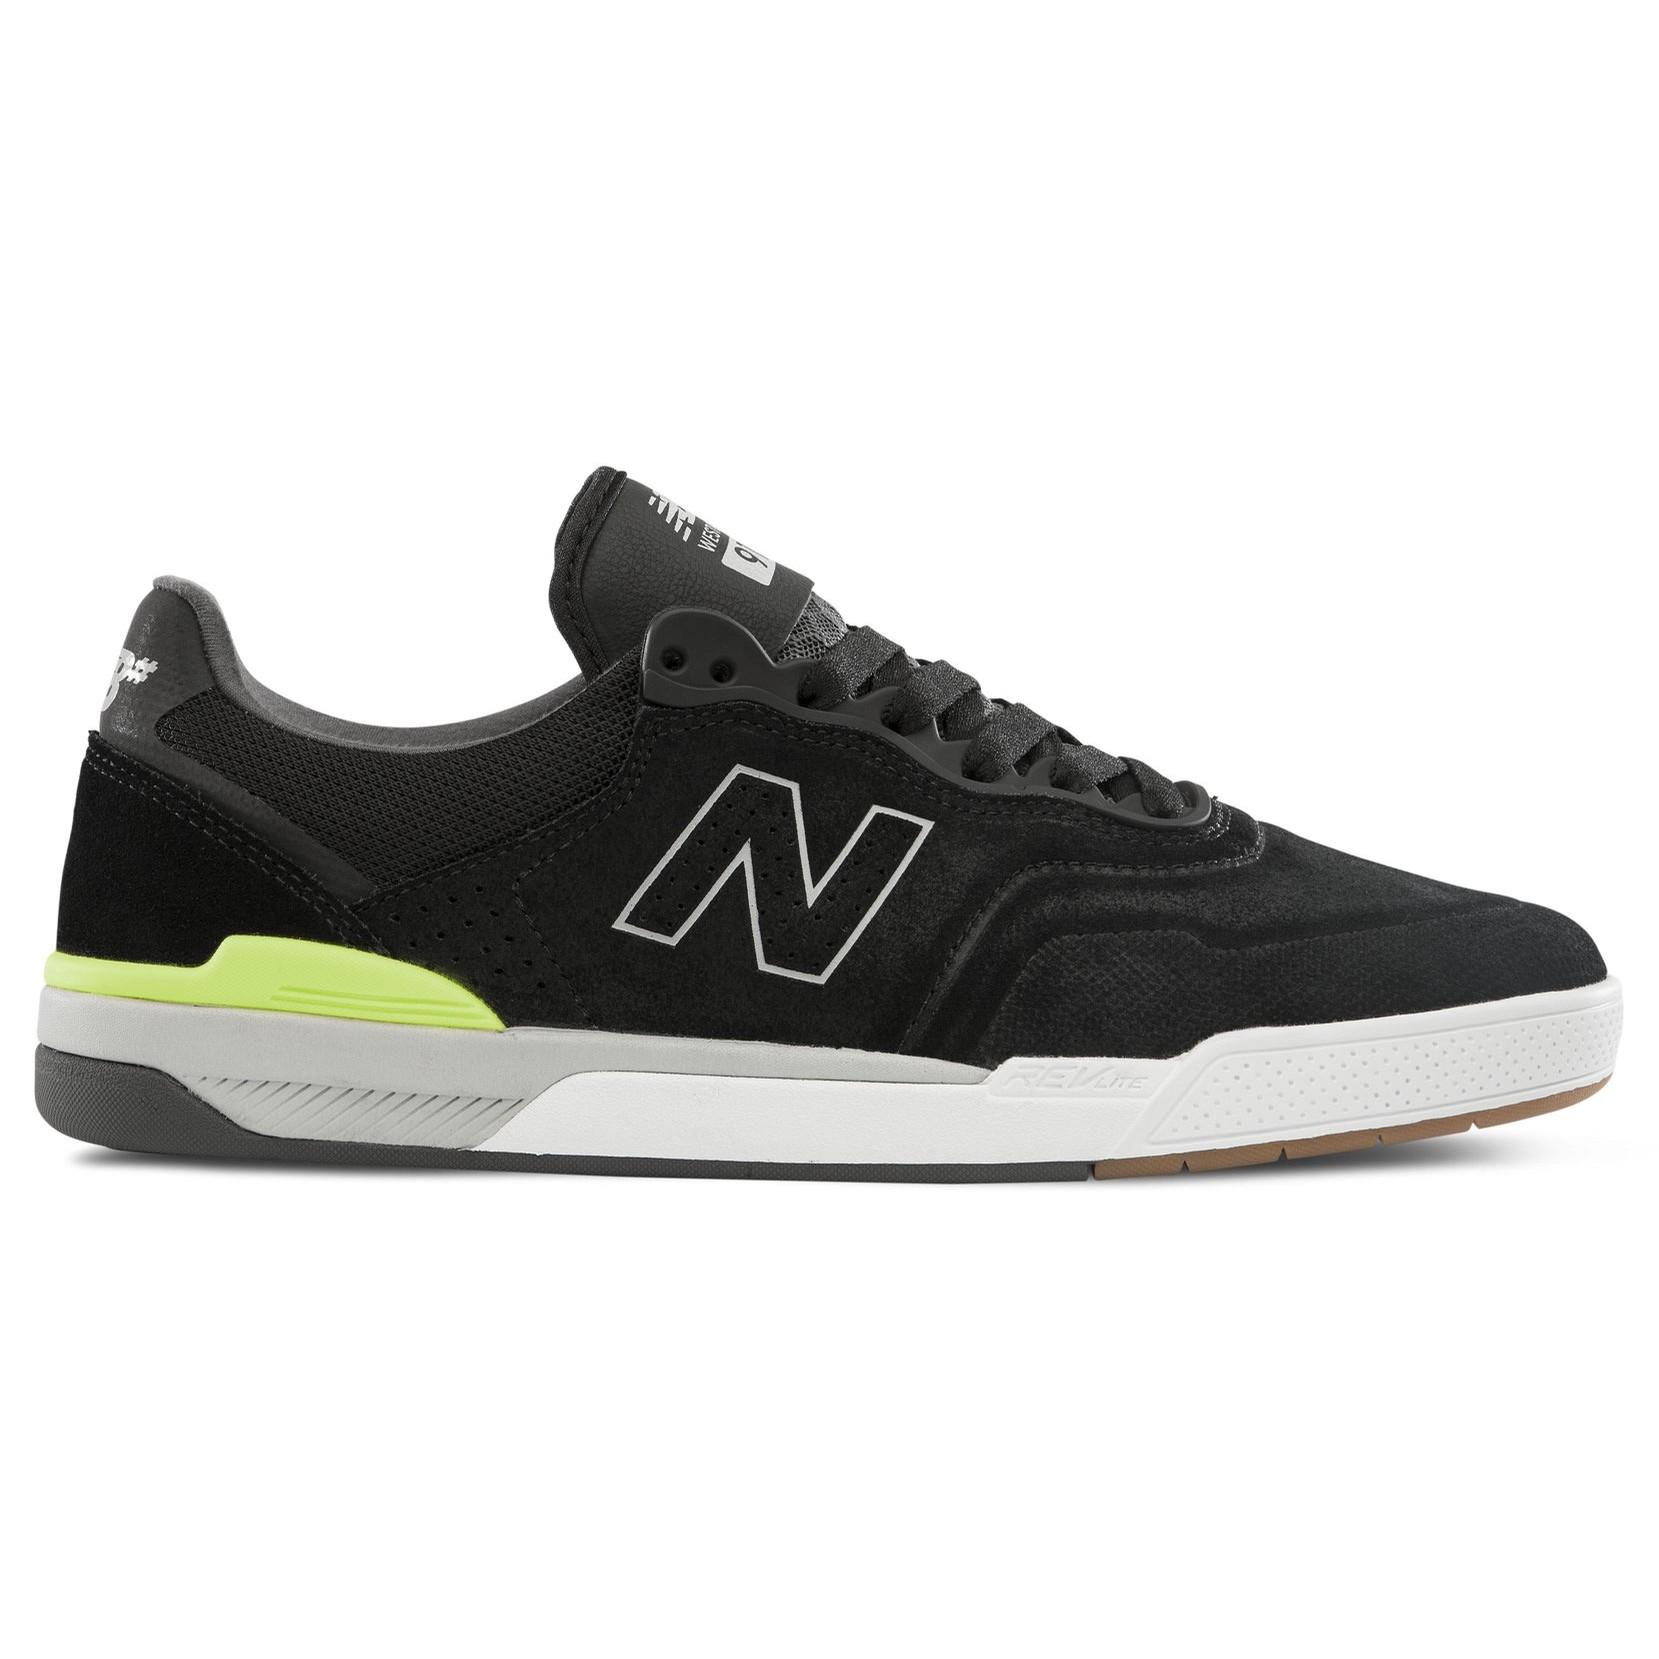 913 (Black/Grey/Lime)